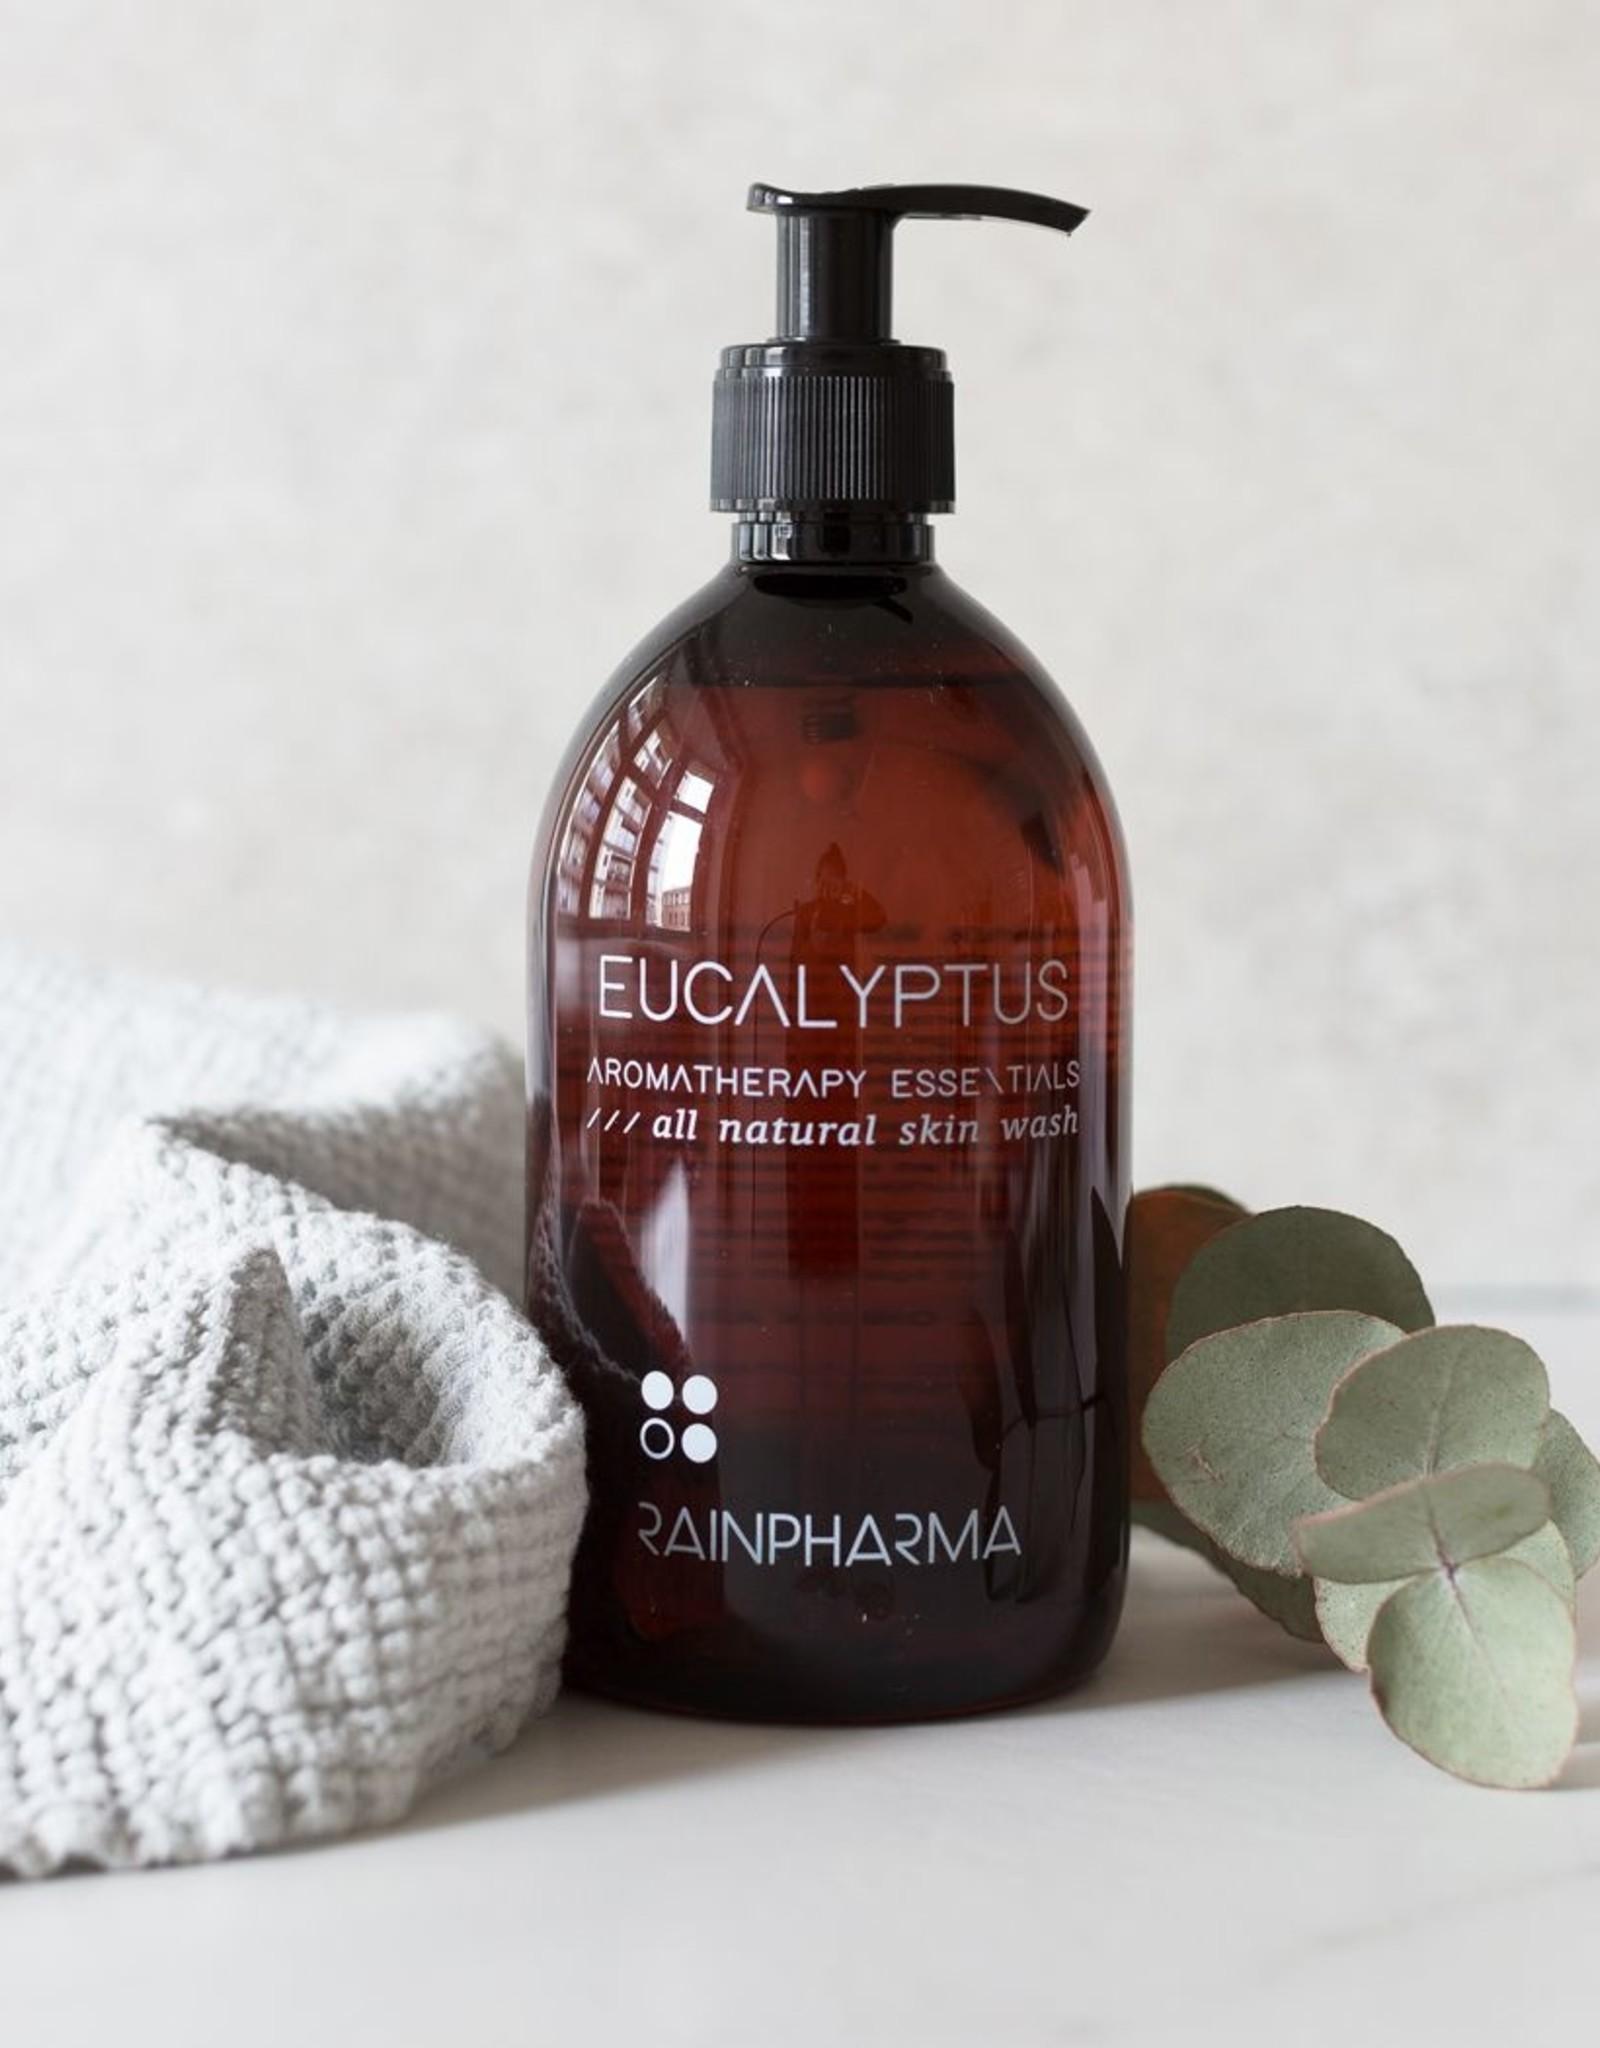 RainPharma Skin Wash Eucalyptus 500ml - Rainpharma